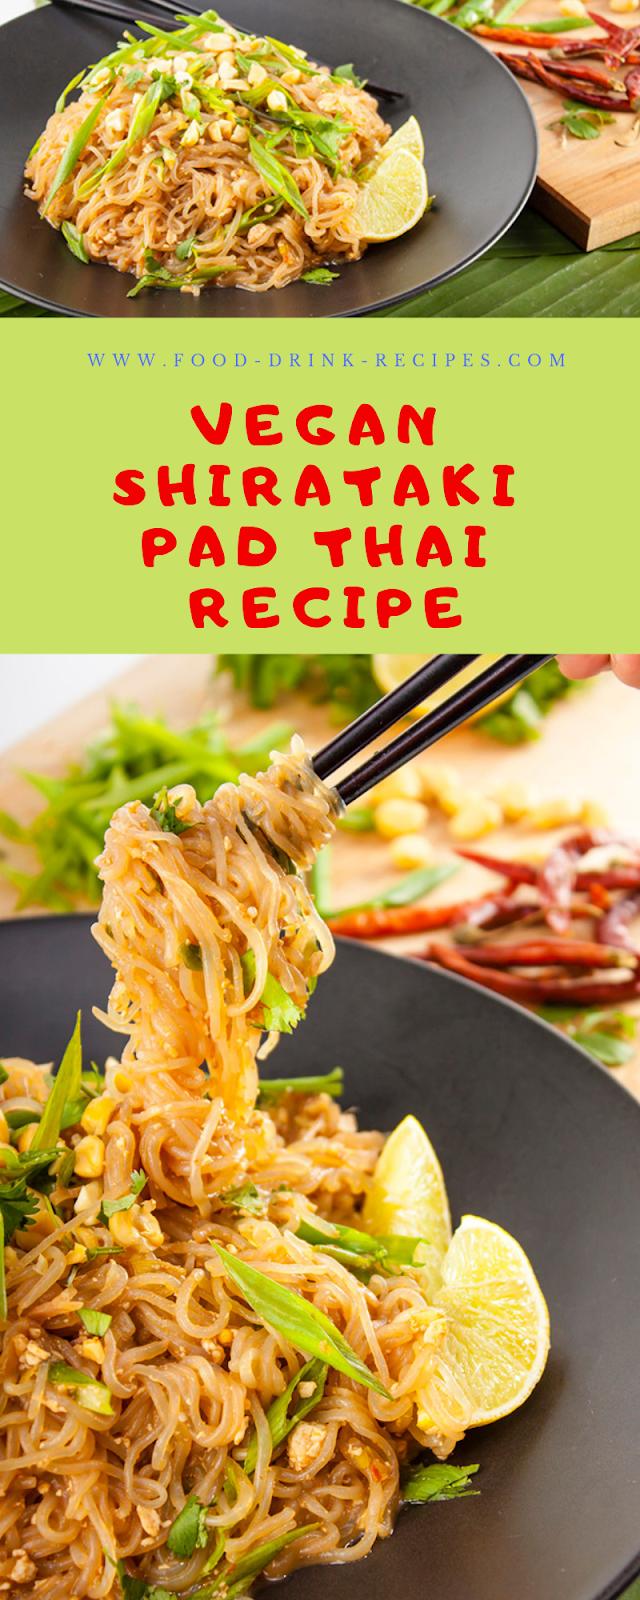 Vegan Shirataki Pad Thai and Miracle Noodle Giveaway